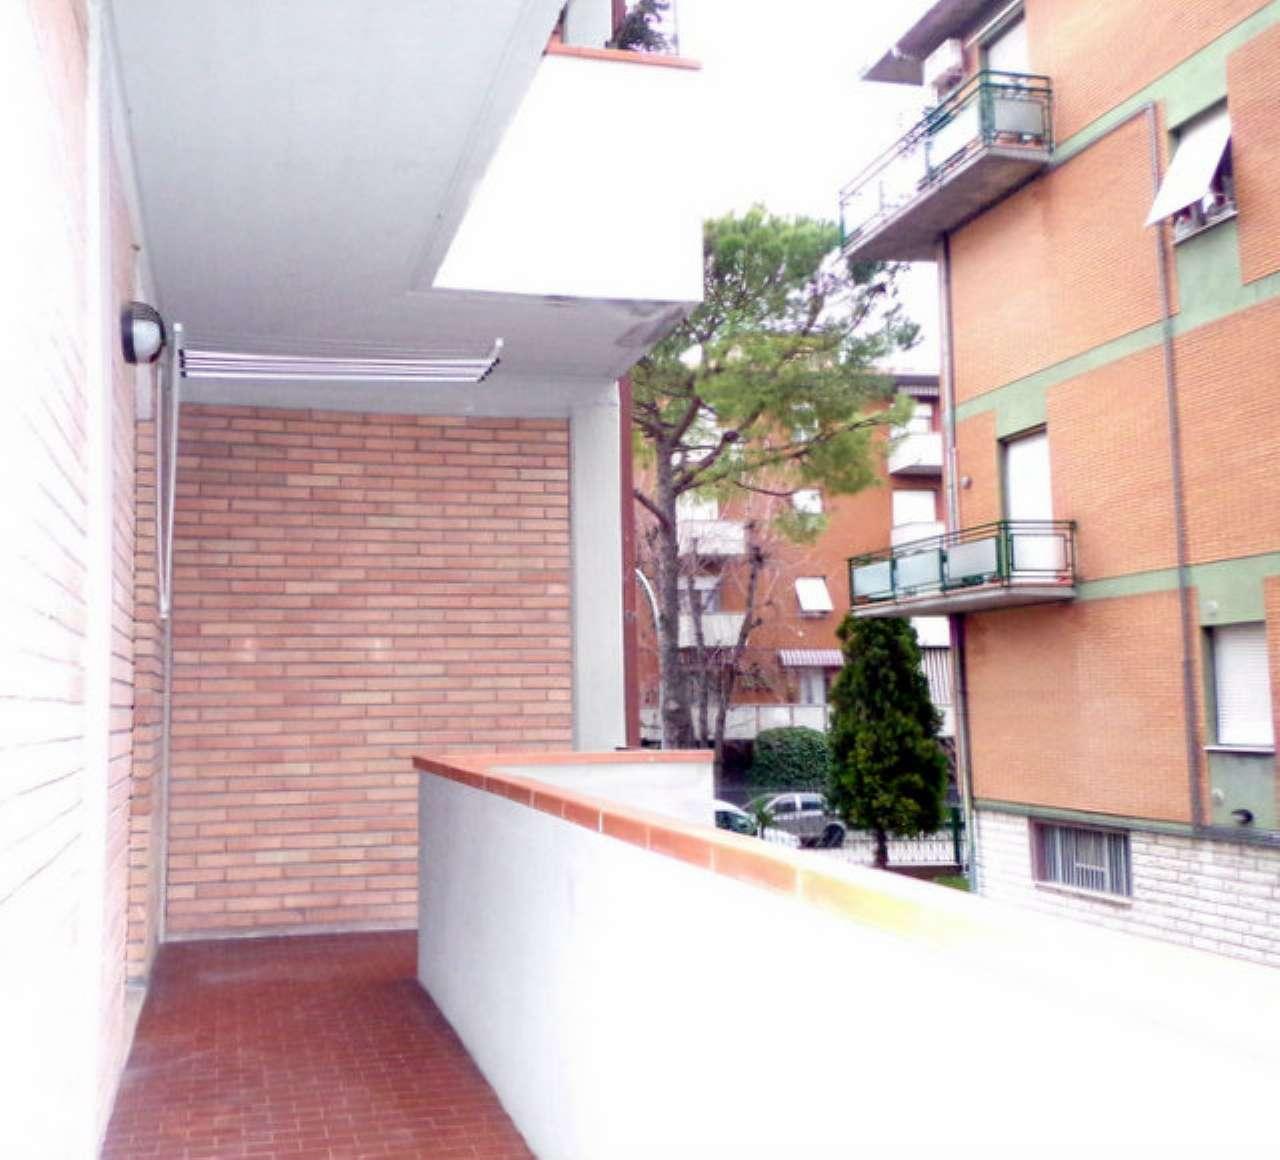 Appartamento, Treves, PISCINA, Vendita - Forlì (Forlì - Cesena)